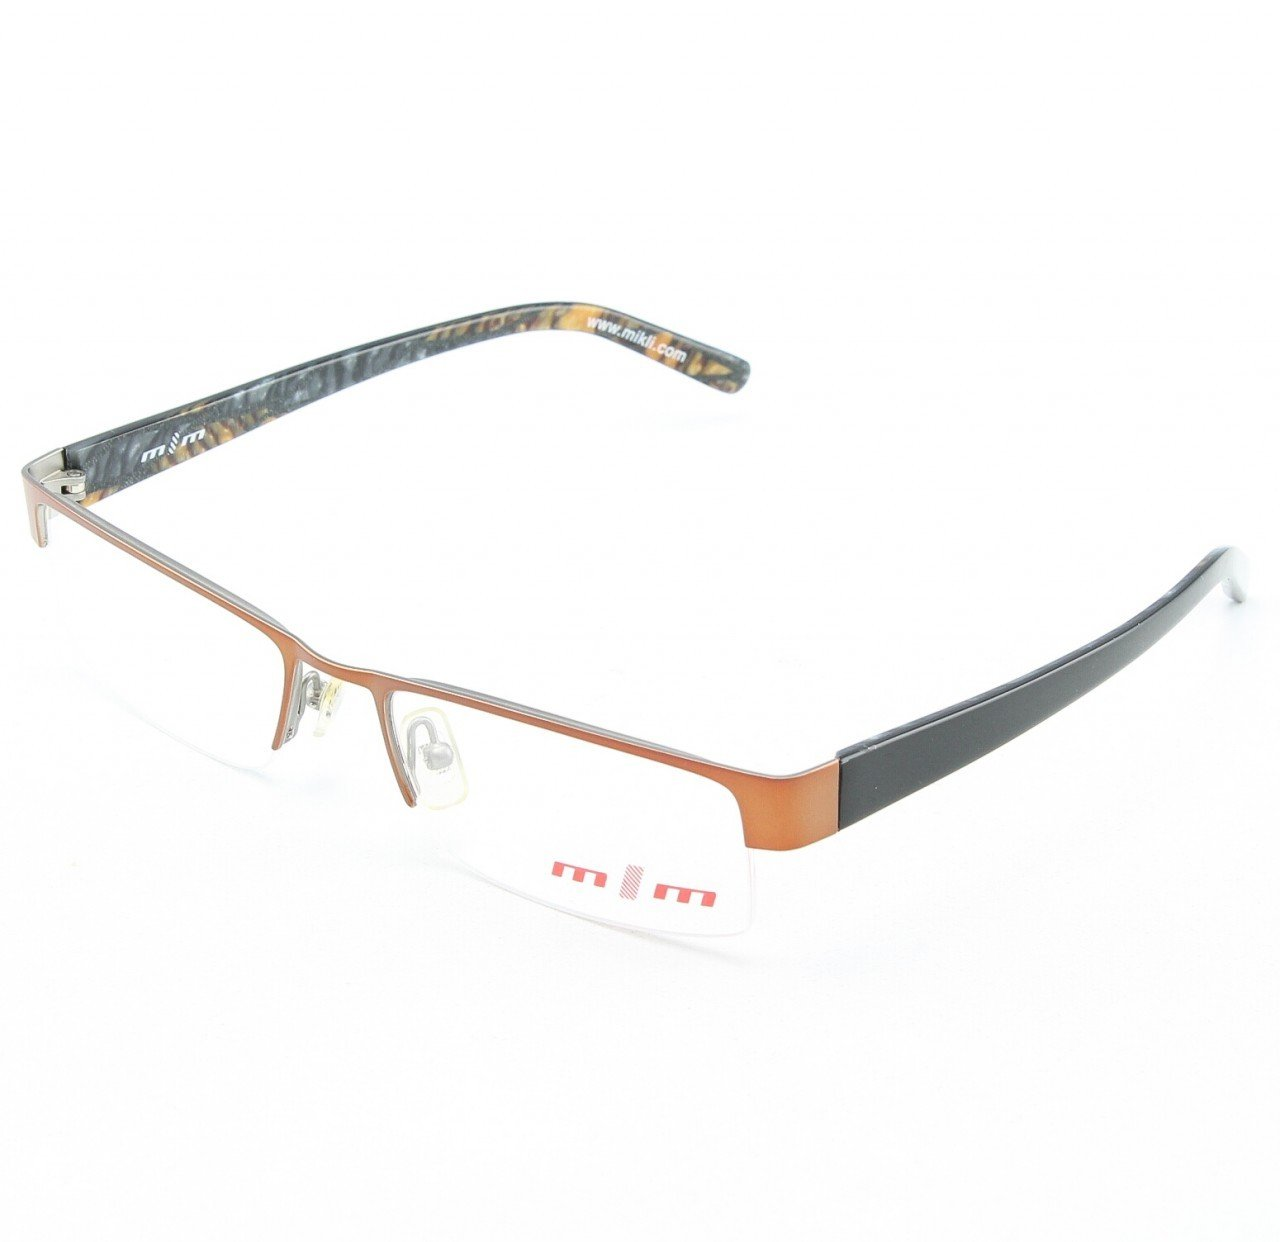 Alain Mikli Eyeglasses 623 05 Bronze Black with Clear Lenses